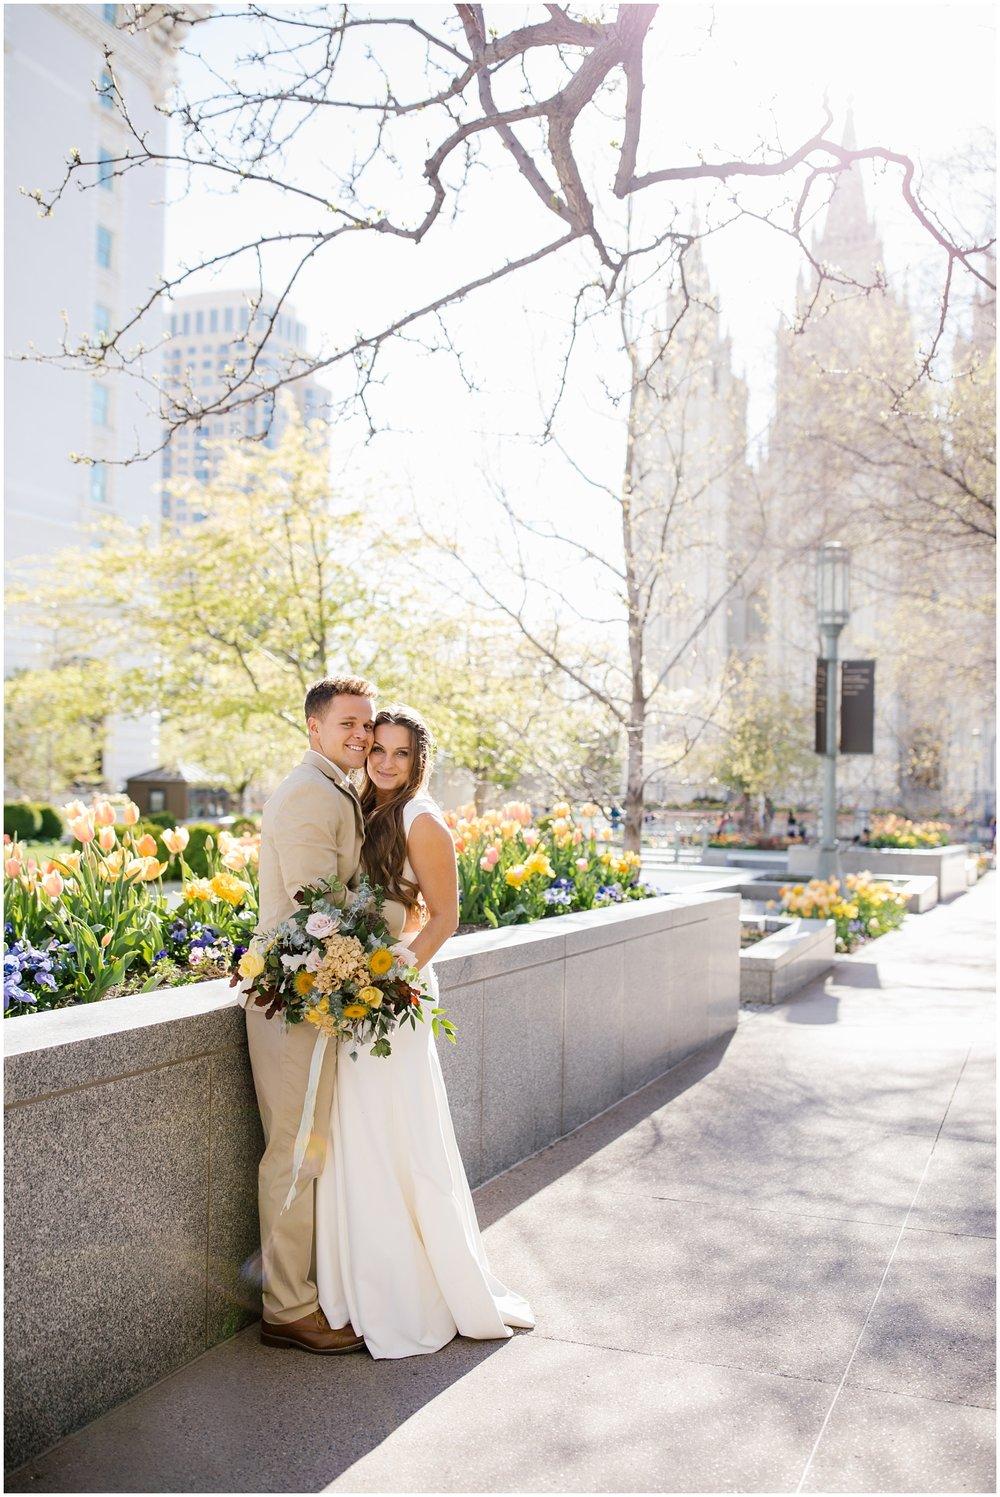 JC-Wedding-236_Lizzie-B-Imagery-Utah-Wedding-Photographer-Park-City-Salt-Lake-City-Temple-Joseph-Smith-Memorial-Building-Empire-Room.jpg